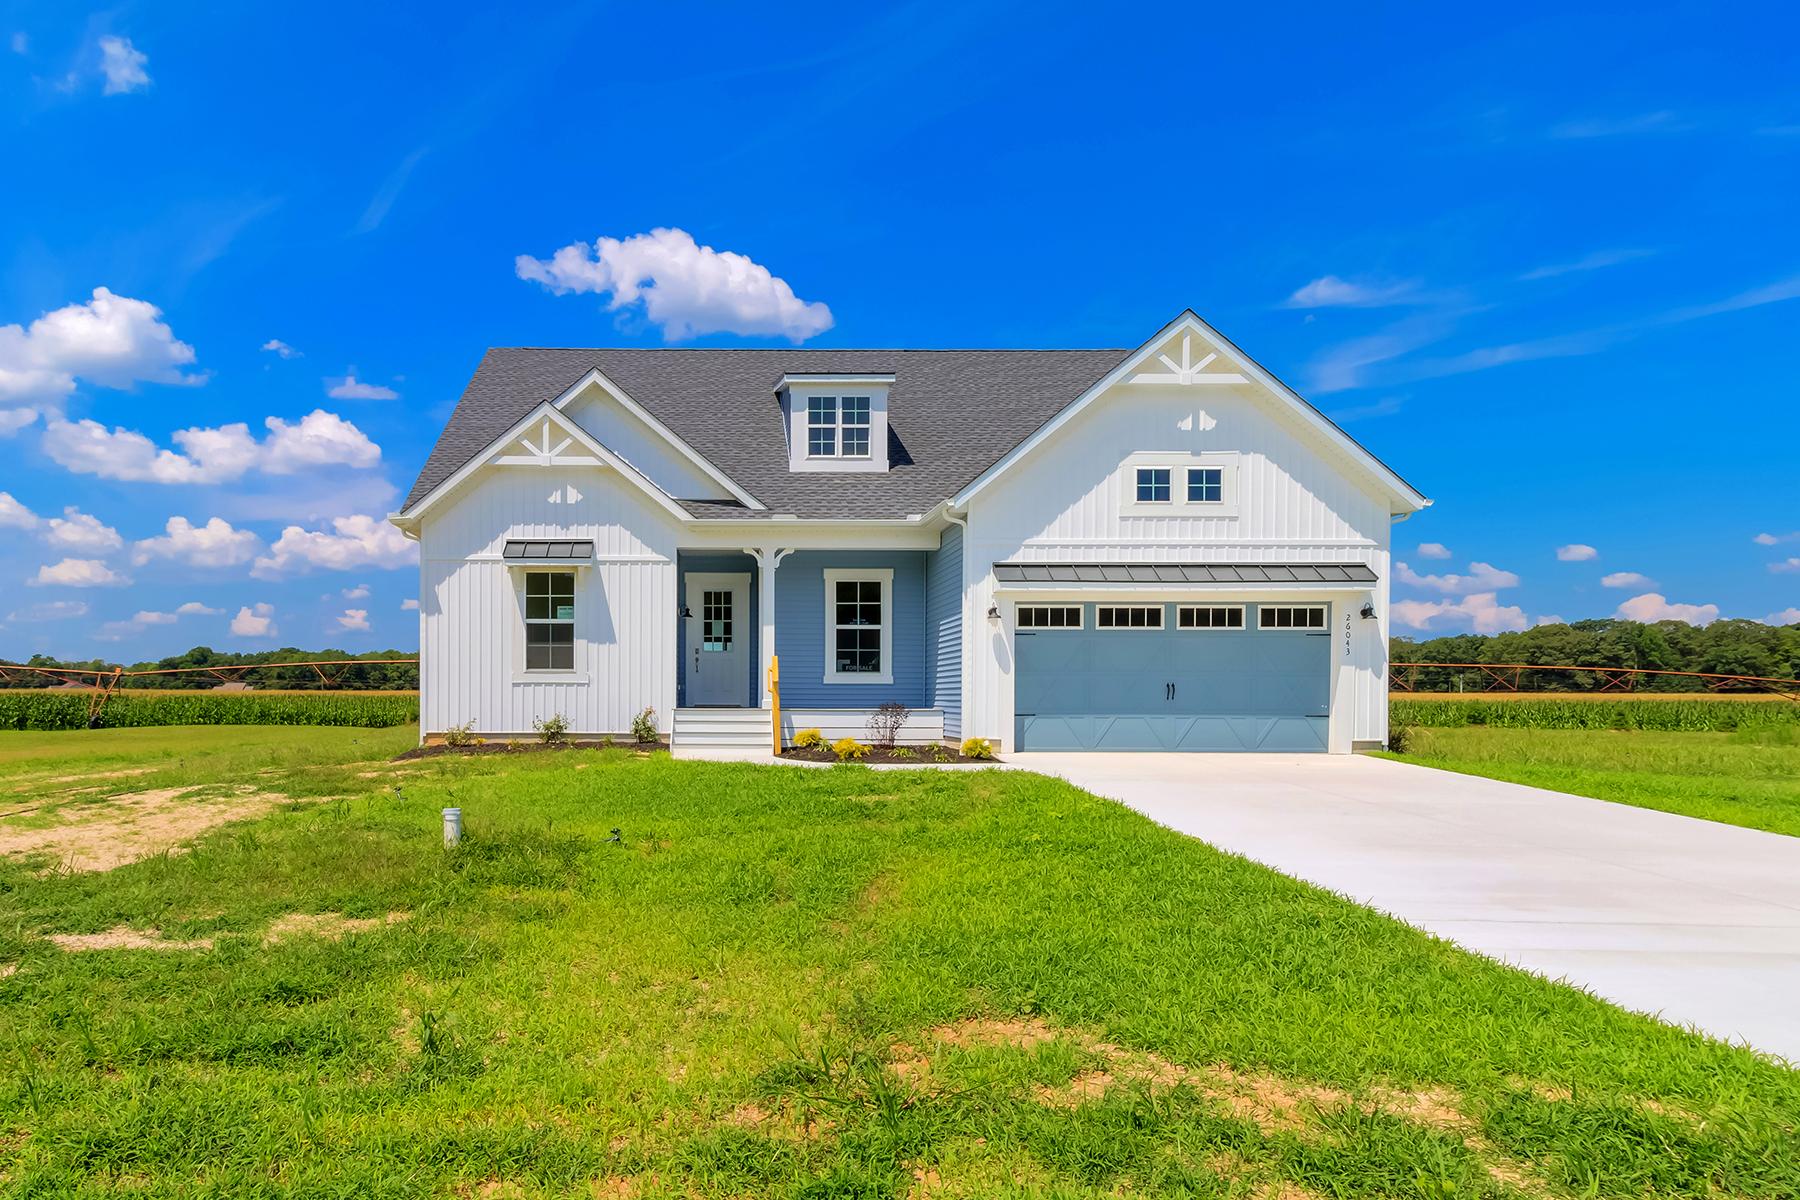 Single Family Homes for Active at 26403 Marys Lane 26043 Marys Lane Milton, Delaware 19968 United States